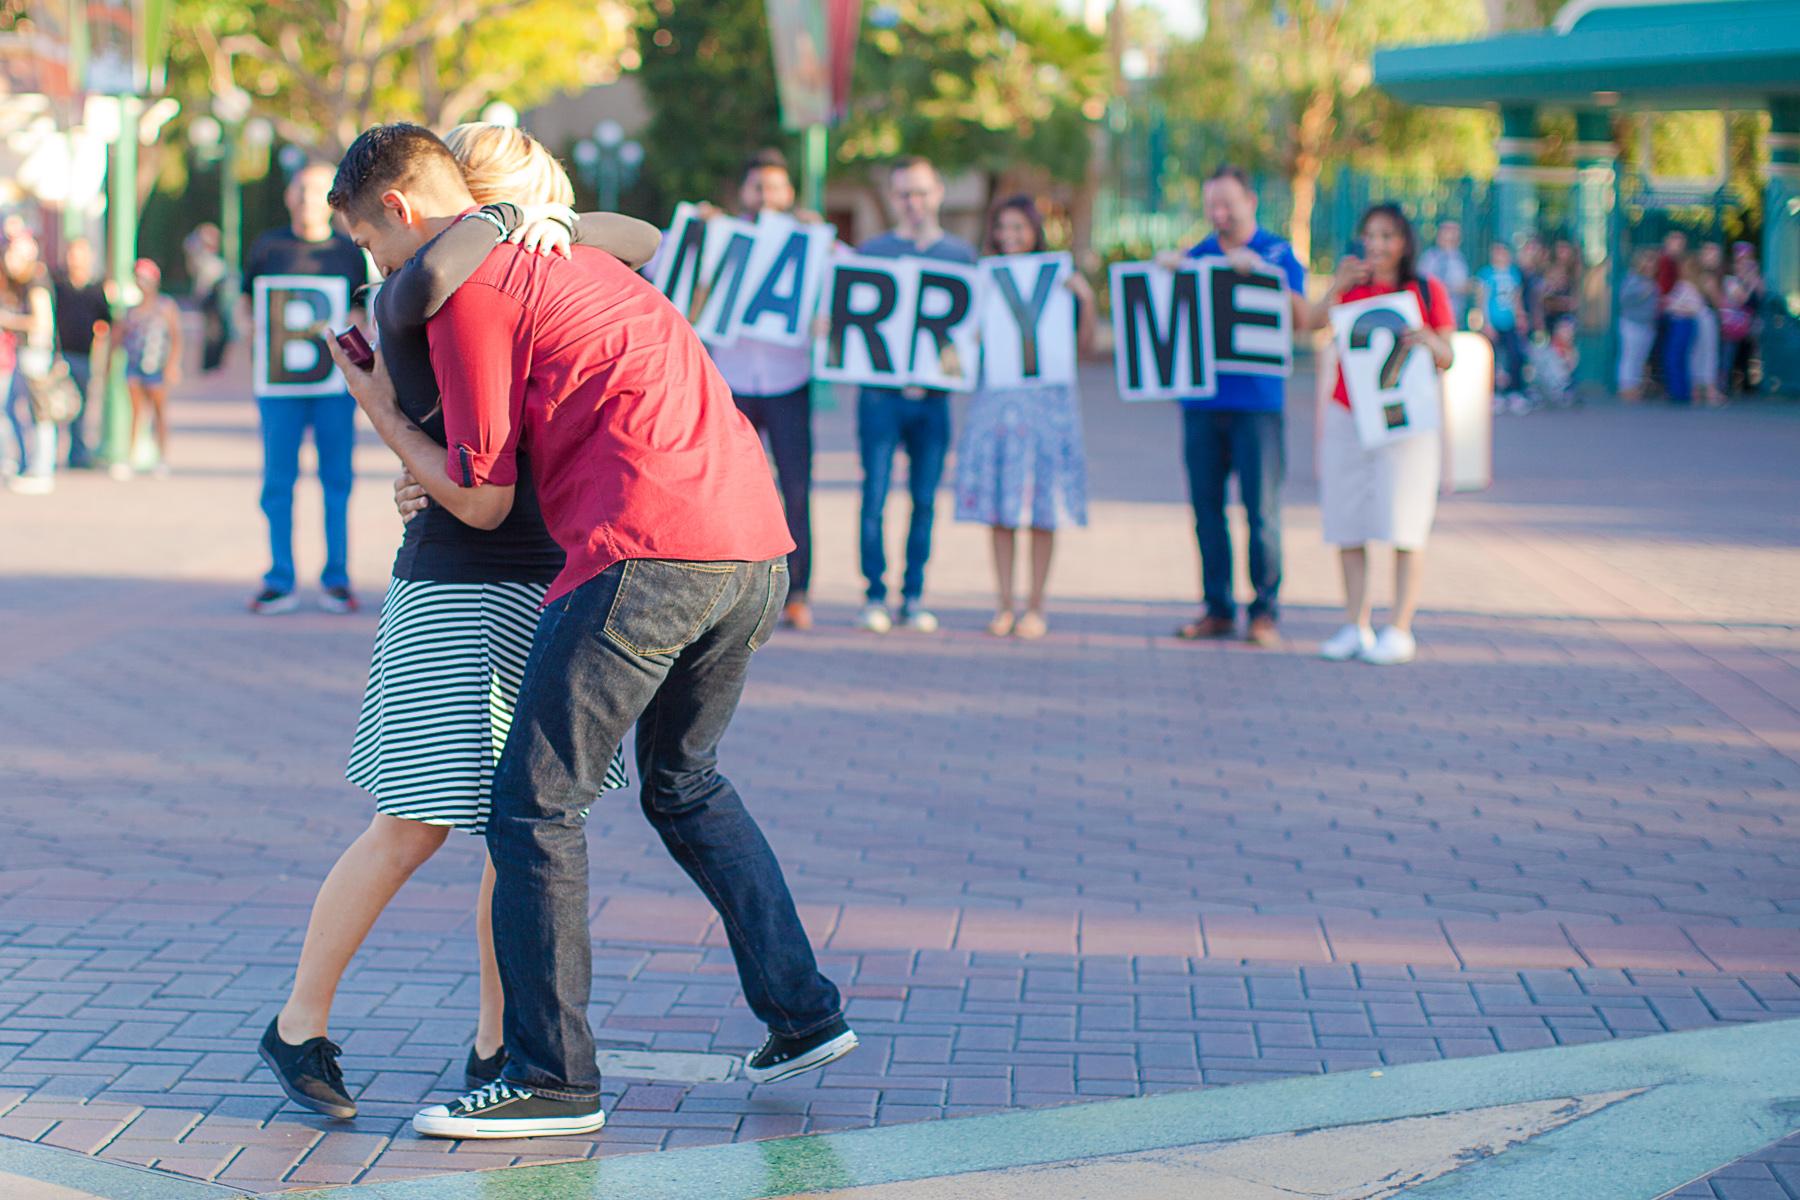 Image 4 of Magical Disneyland Proposal